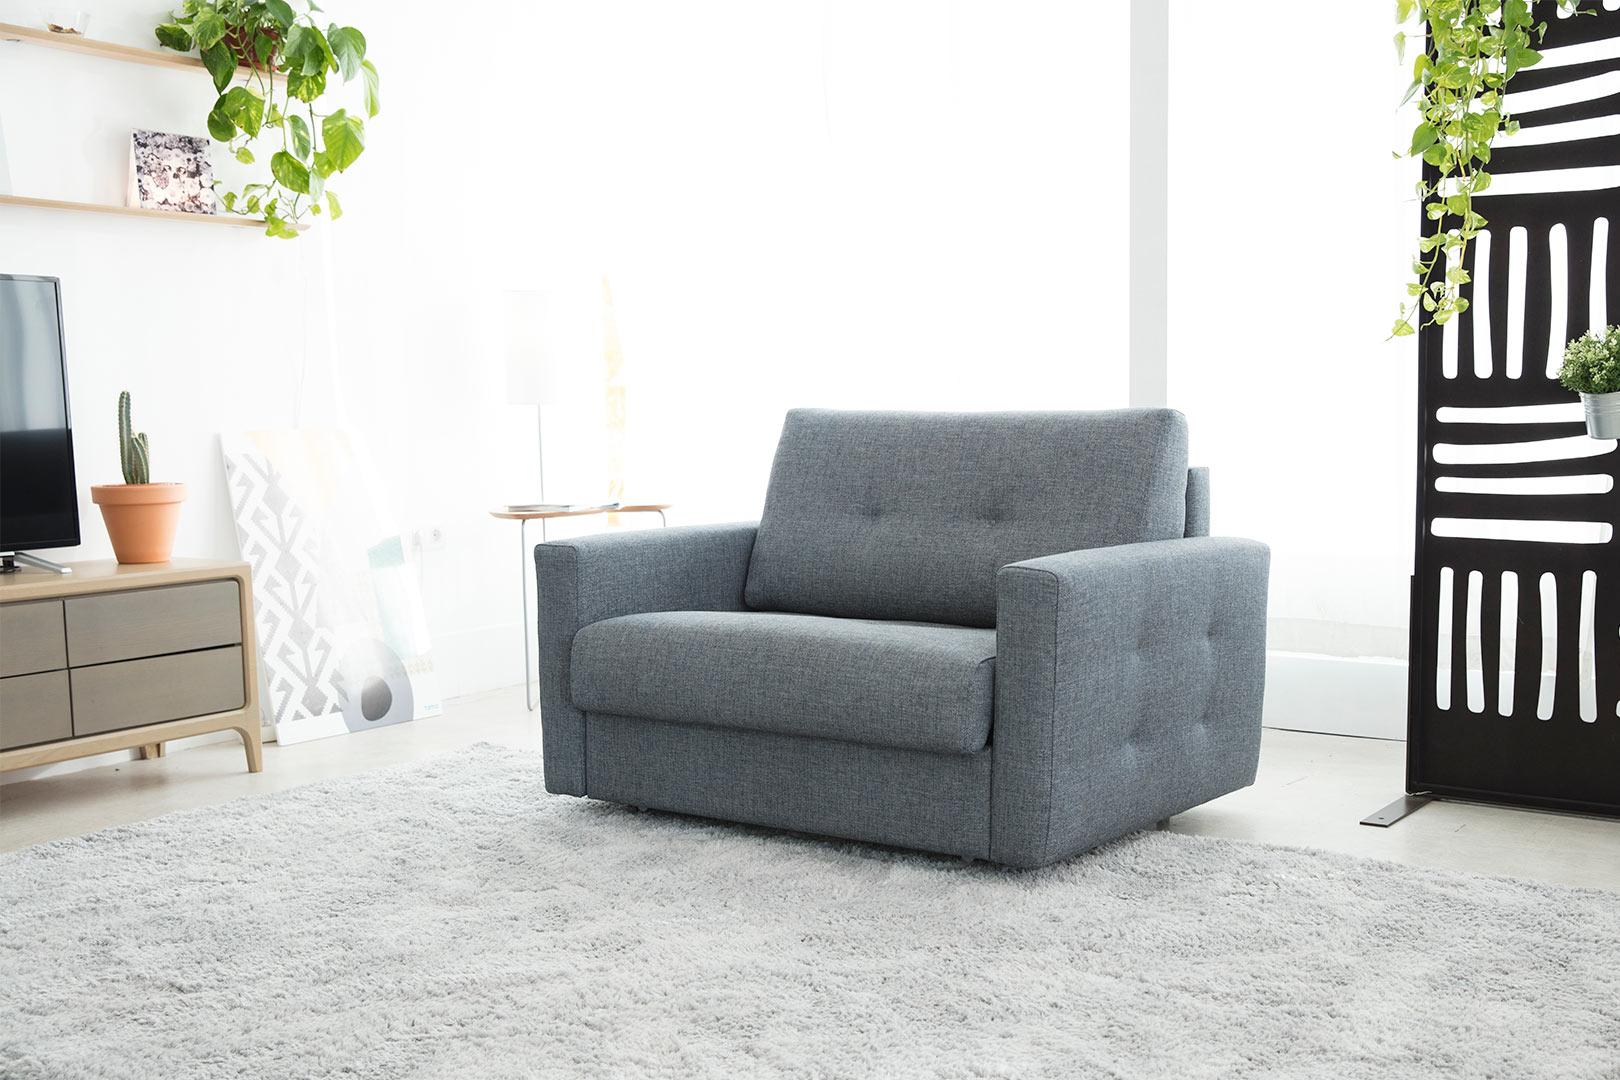 Bolero sillón cama fama 2020 02